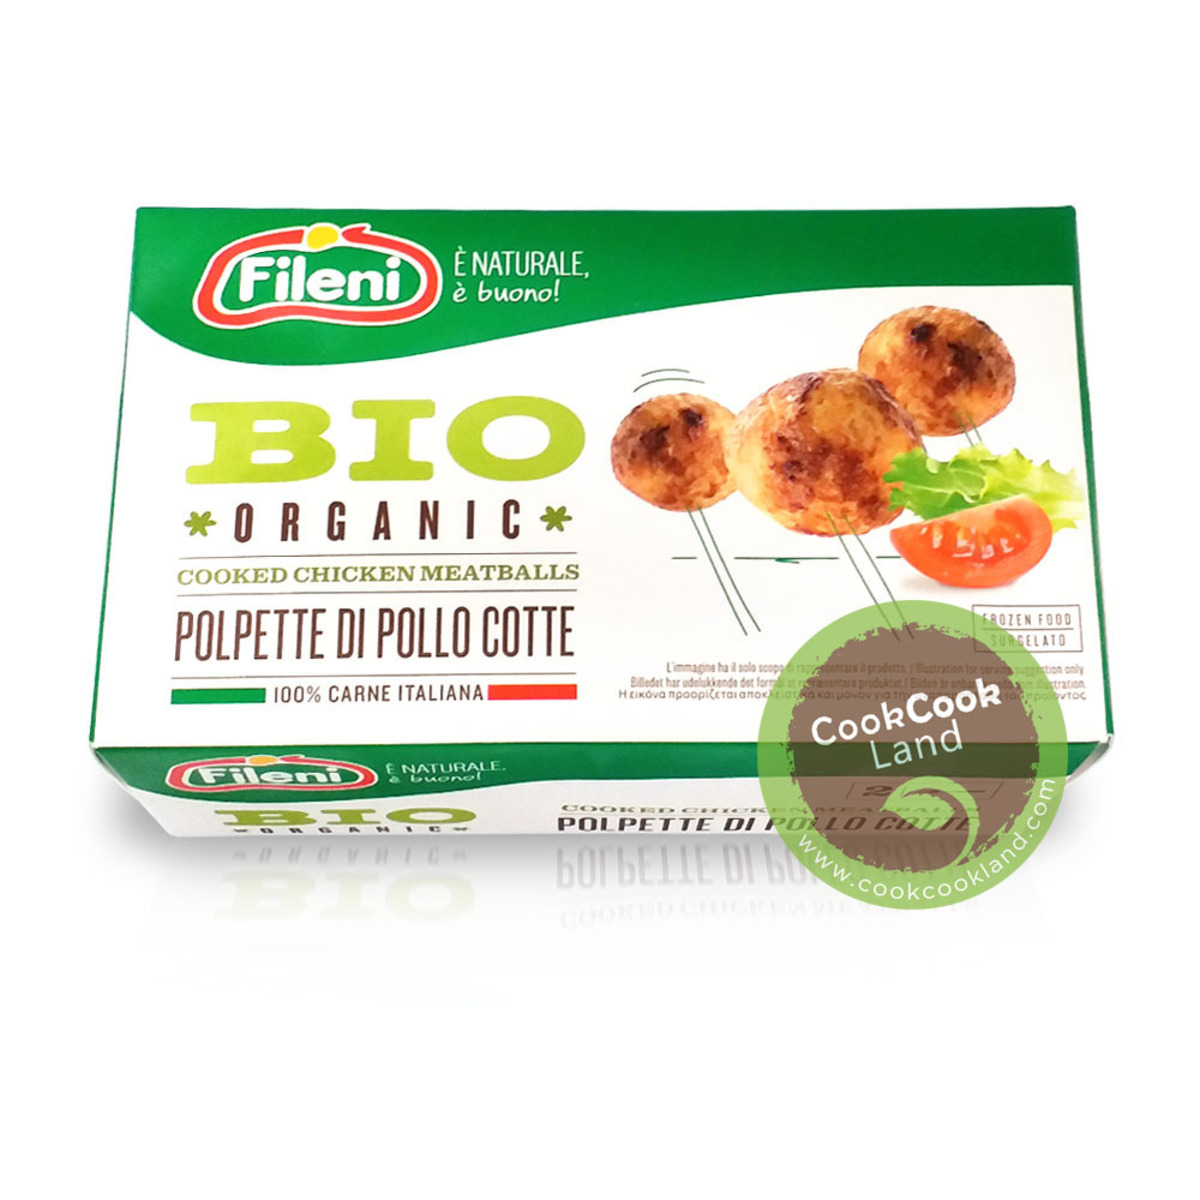 Fileni 意大利有機煮熟雞肉丸 320g